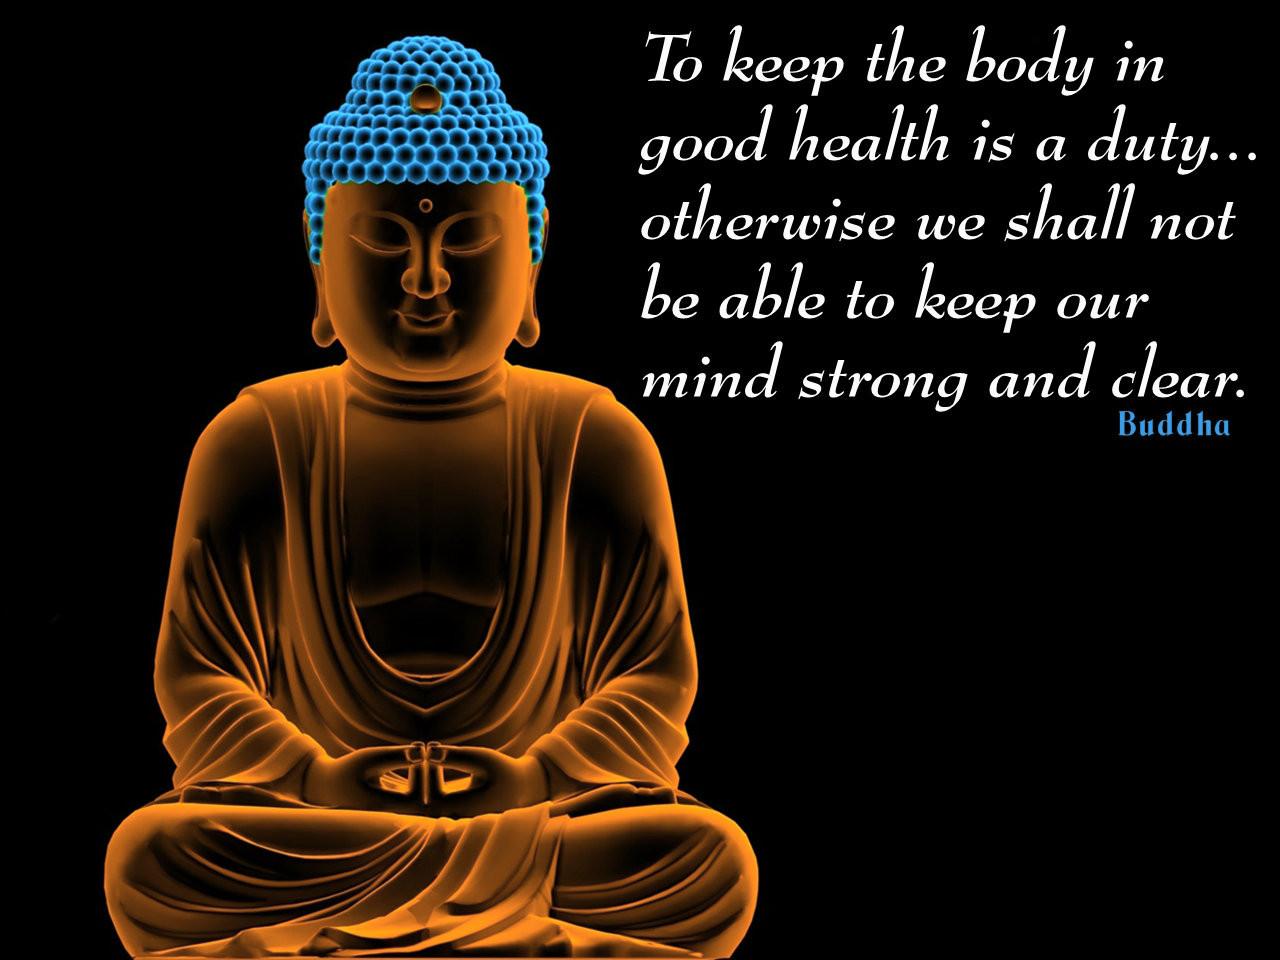 Good Health Quotes Tokeepthebodyingoodhealthisadutyotherwiseweshallnot